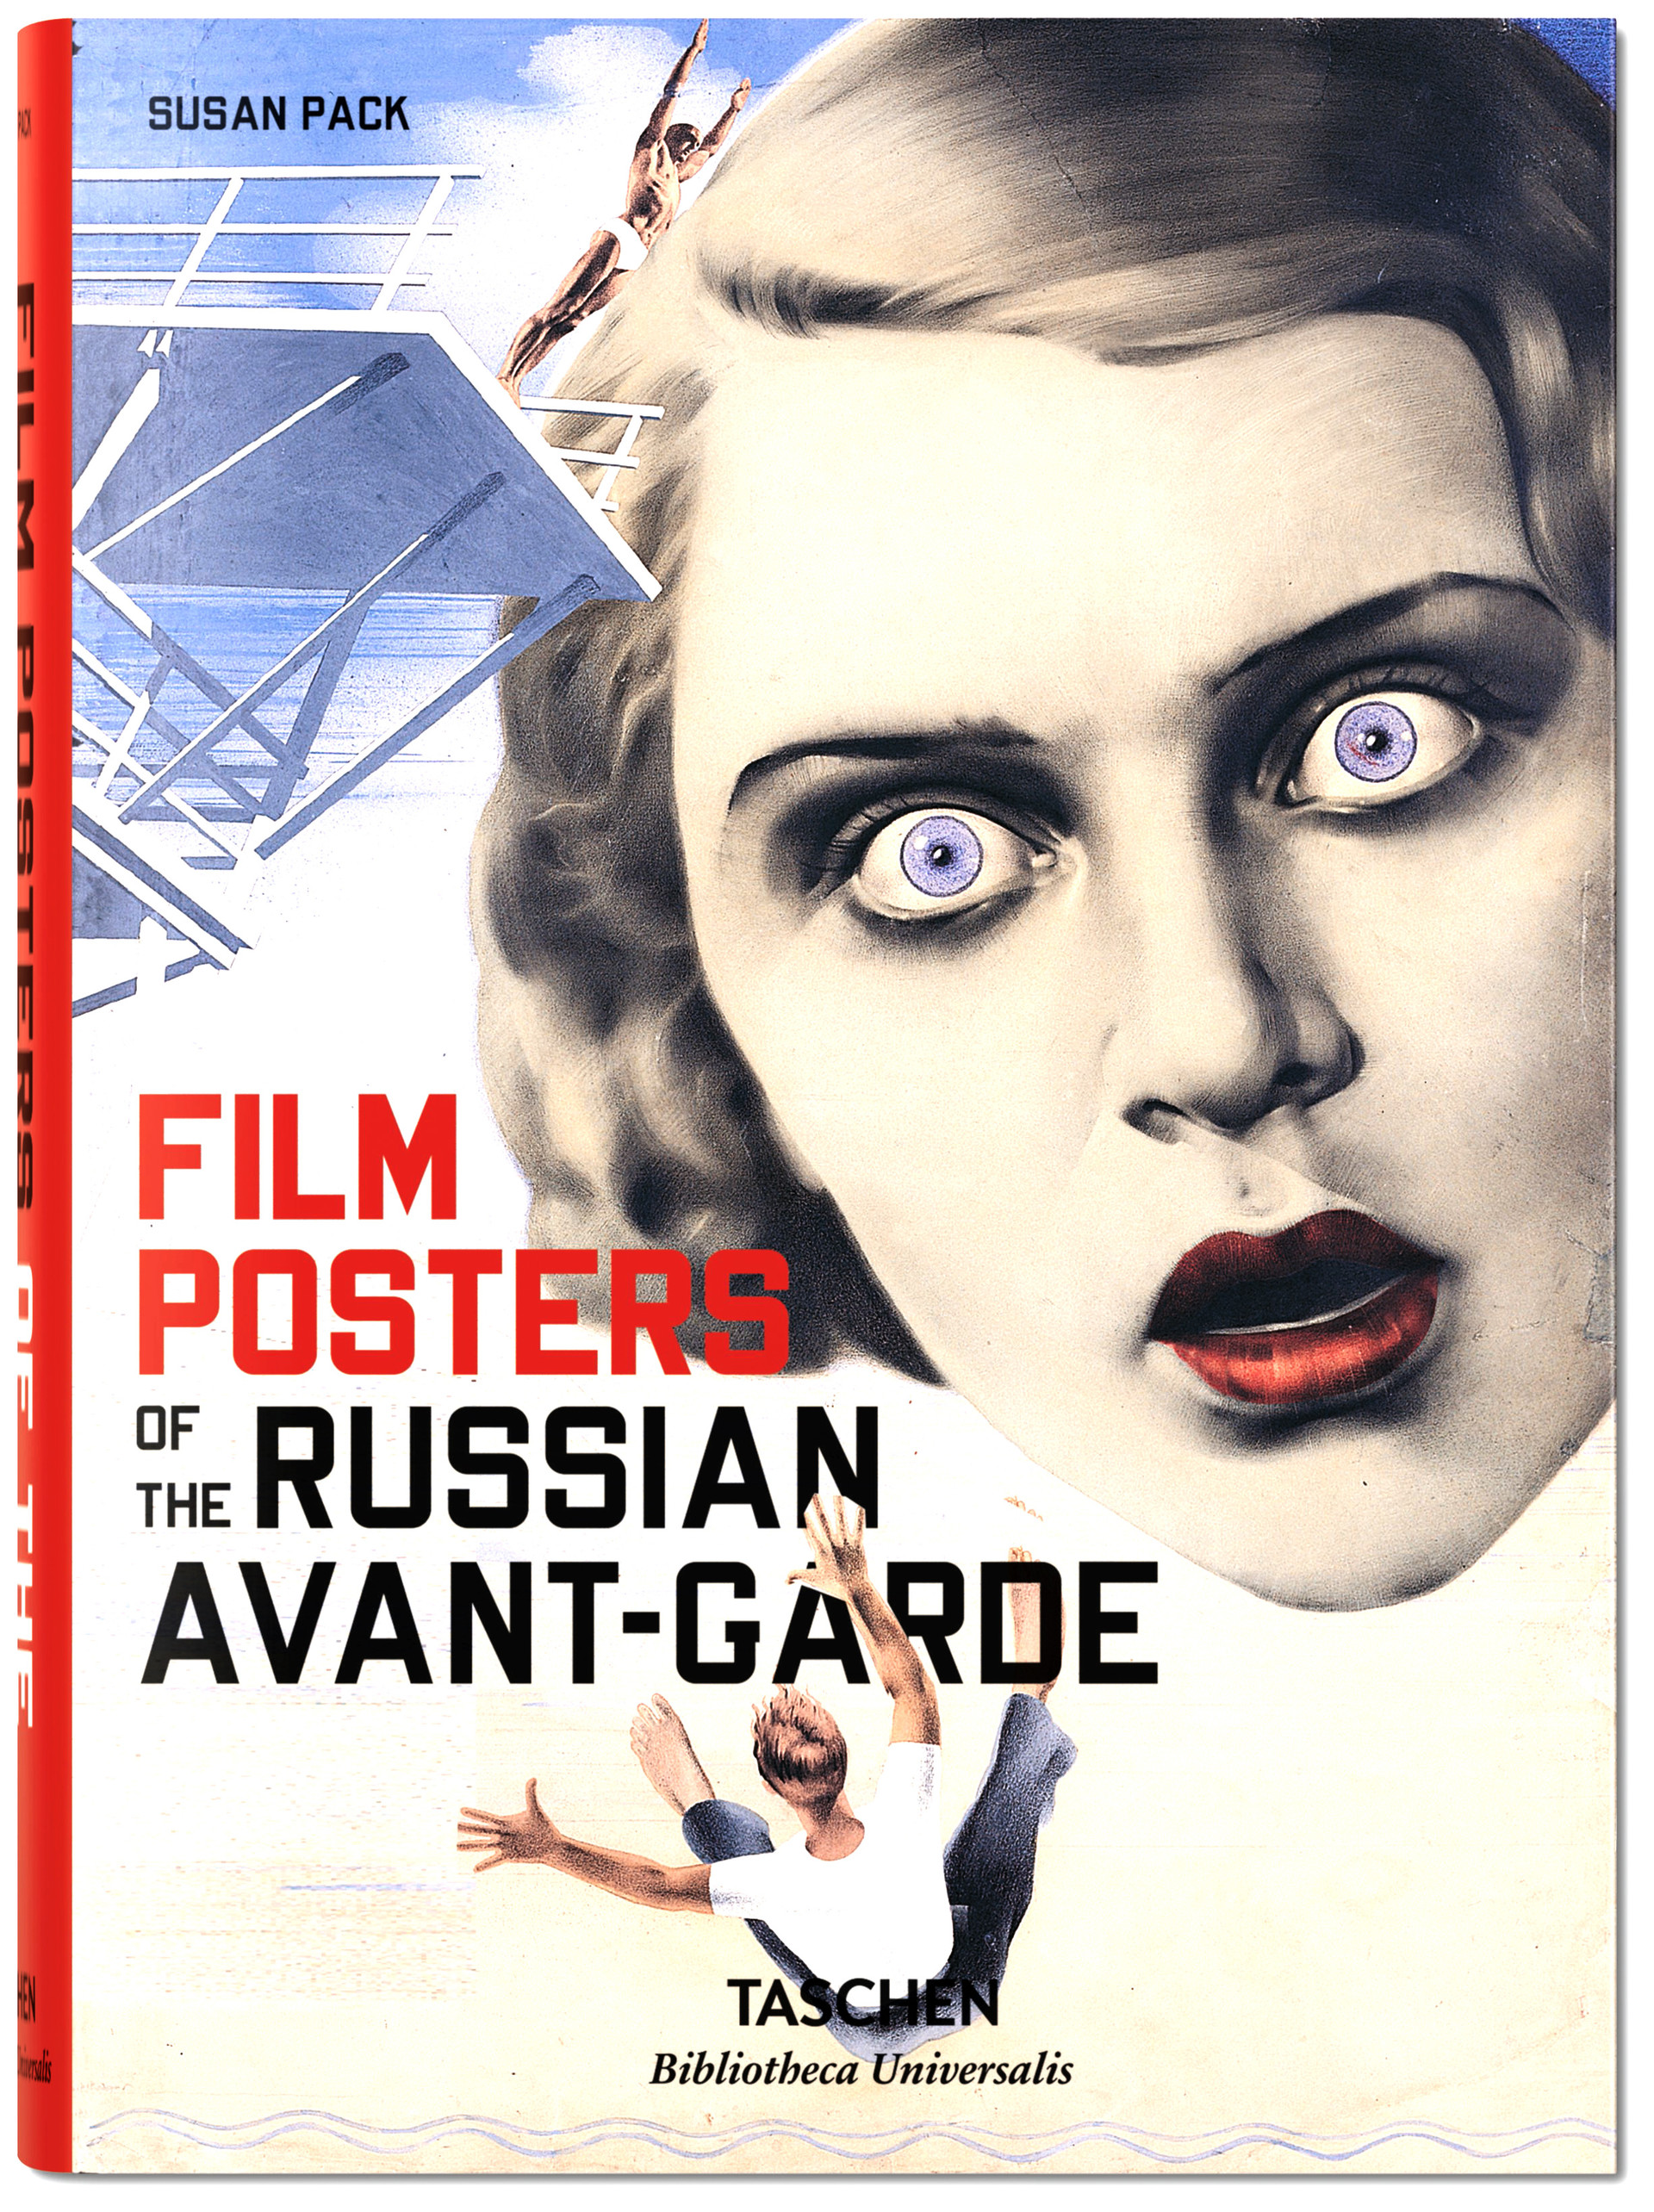 Portada del libro: 'Carteles de cine de la vanguardia rusa'.